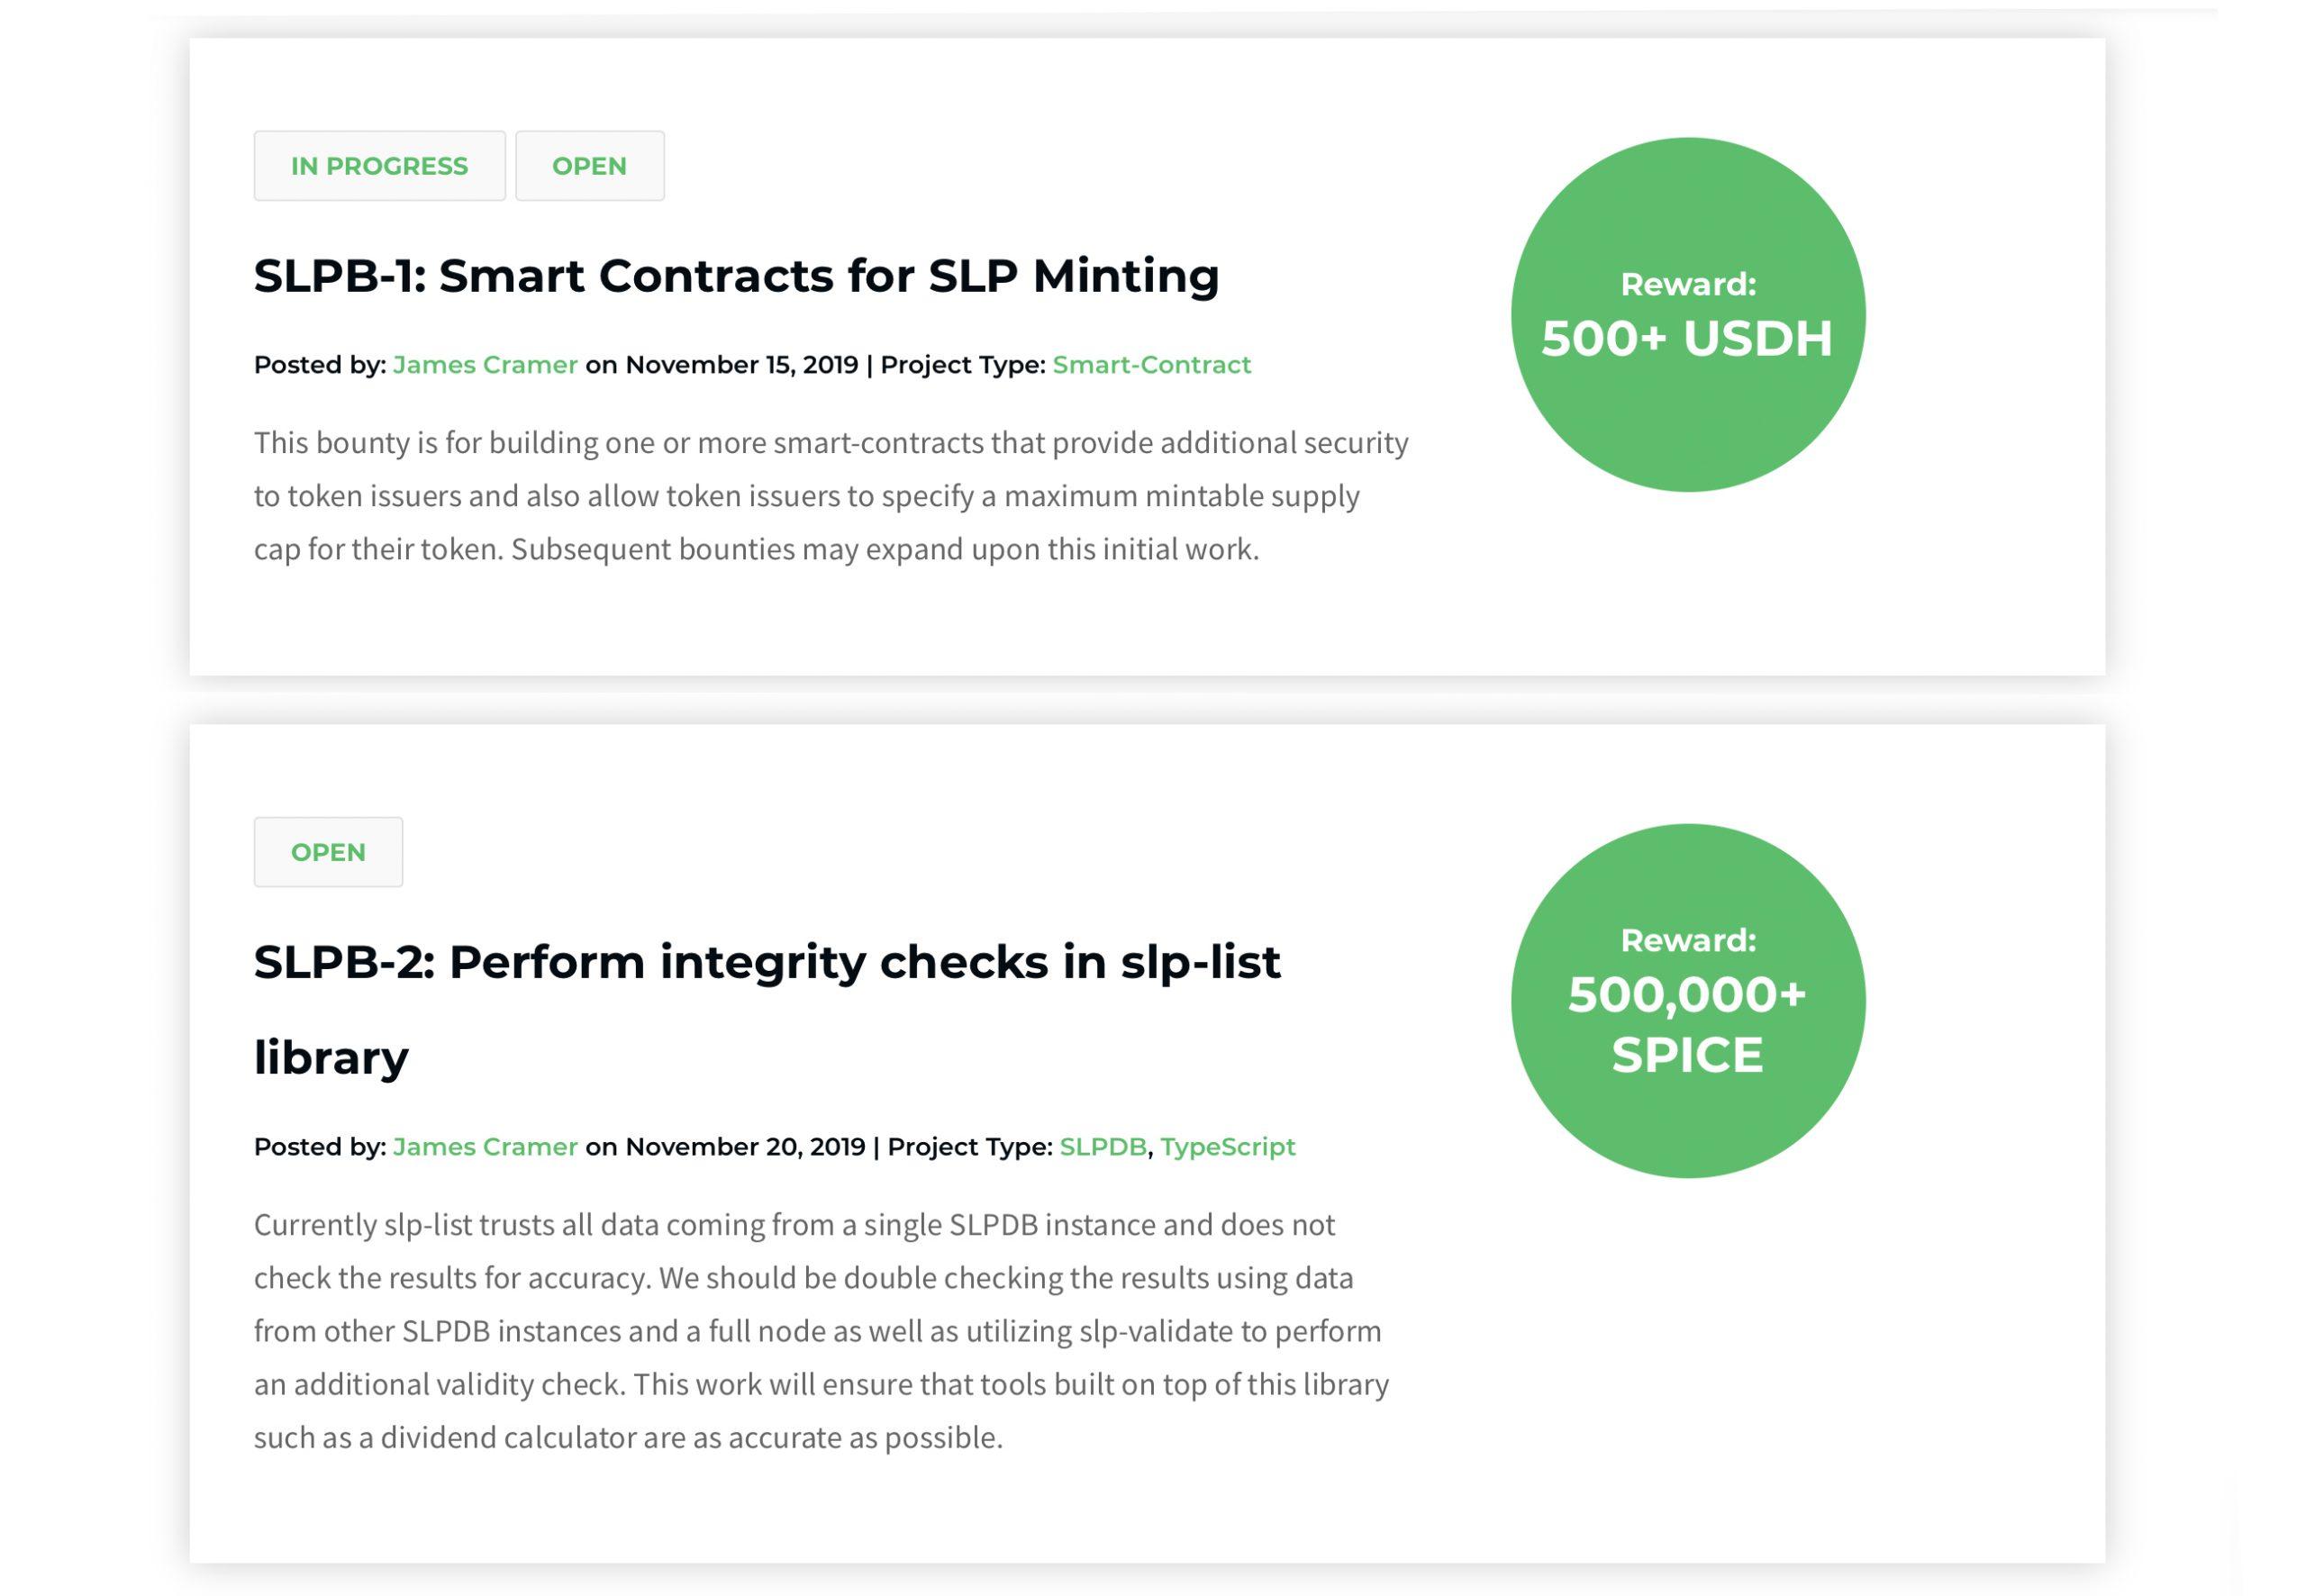 "Los desarrolladores de SLP publican recompensas de código con $ 2,500 + en Crypto Rewards ""width ="" 2560 ""height ="" 1772 "" srcset = ""https://blackswanfinances.com/wp-content/uploads/2020/01/bount6e66e66e6e-scaled.jpg 2560w, https://news.bitcoin.com/wp-content/uploads/2020/01/ bount6e66e66e6e-300x208.jpg 300w, https://news.bitcoin.com/wp-content/uploads/2020/01/bount6e66e66e6e-1024x709.jpg 1024w, https://news.bitcoin.com/wp-content/uploads/ 2020/01 / bount6e66e66e6e-768x532.jpg 768w, https://news.bitcoin.com/wp-content/uploads/2020/01/bount6e66e66e6e-1536x1063.jpg 1536w, https://news.bitcoin.com/wp- content / uploads / 2020/01 / bount6e66e66e6e-2048x1418.jpg 2048w, https://news.bitcoin.com/wp-content/uploads/2020/01/bount6e66e66e6e-100x70.jpg 100w, https: //news.bitcoin. com / wp-content / uploads / 2020/01 / bount6e66e66e6e-218x150.jpg 218w, https://news.bitcoin.com/wp-content/uploads/2020/01/bount6e66e66e6e-696x482 .jpg 696w, https://news.bitcoin.com/wp-content/uploads/2020/01/bount6e66e66e6e-1392x964.jpg 1392w, https://news.bitcoin.com/wp-content/uploads/2020/01 /bount6e66e66e6e-1068x739.jpg 1068w, https://news.bitcoin.com/wp-content/uploads/2020/01/bount6e66e66e6e-607x420.jpg 607w, https://news.bitcoin.com/wp-content/uploads /2020/01/bount6e66e66e6e-1920x1329.jpg 1920w ""tamaños ="" (ancho máximo: 2560px) 100vw, 2560px"